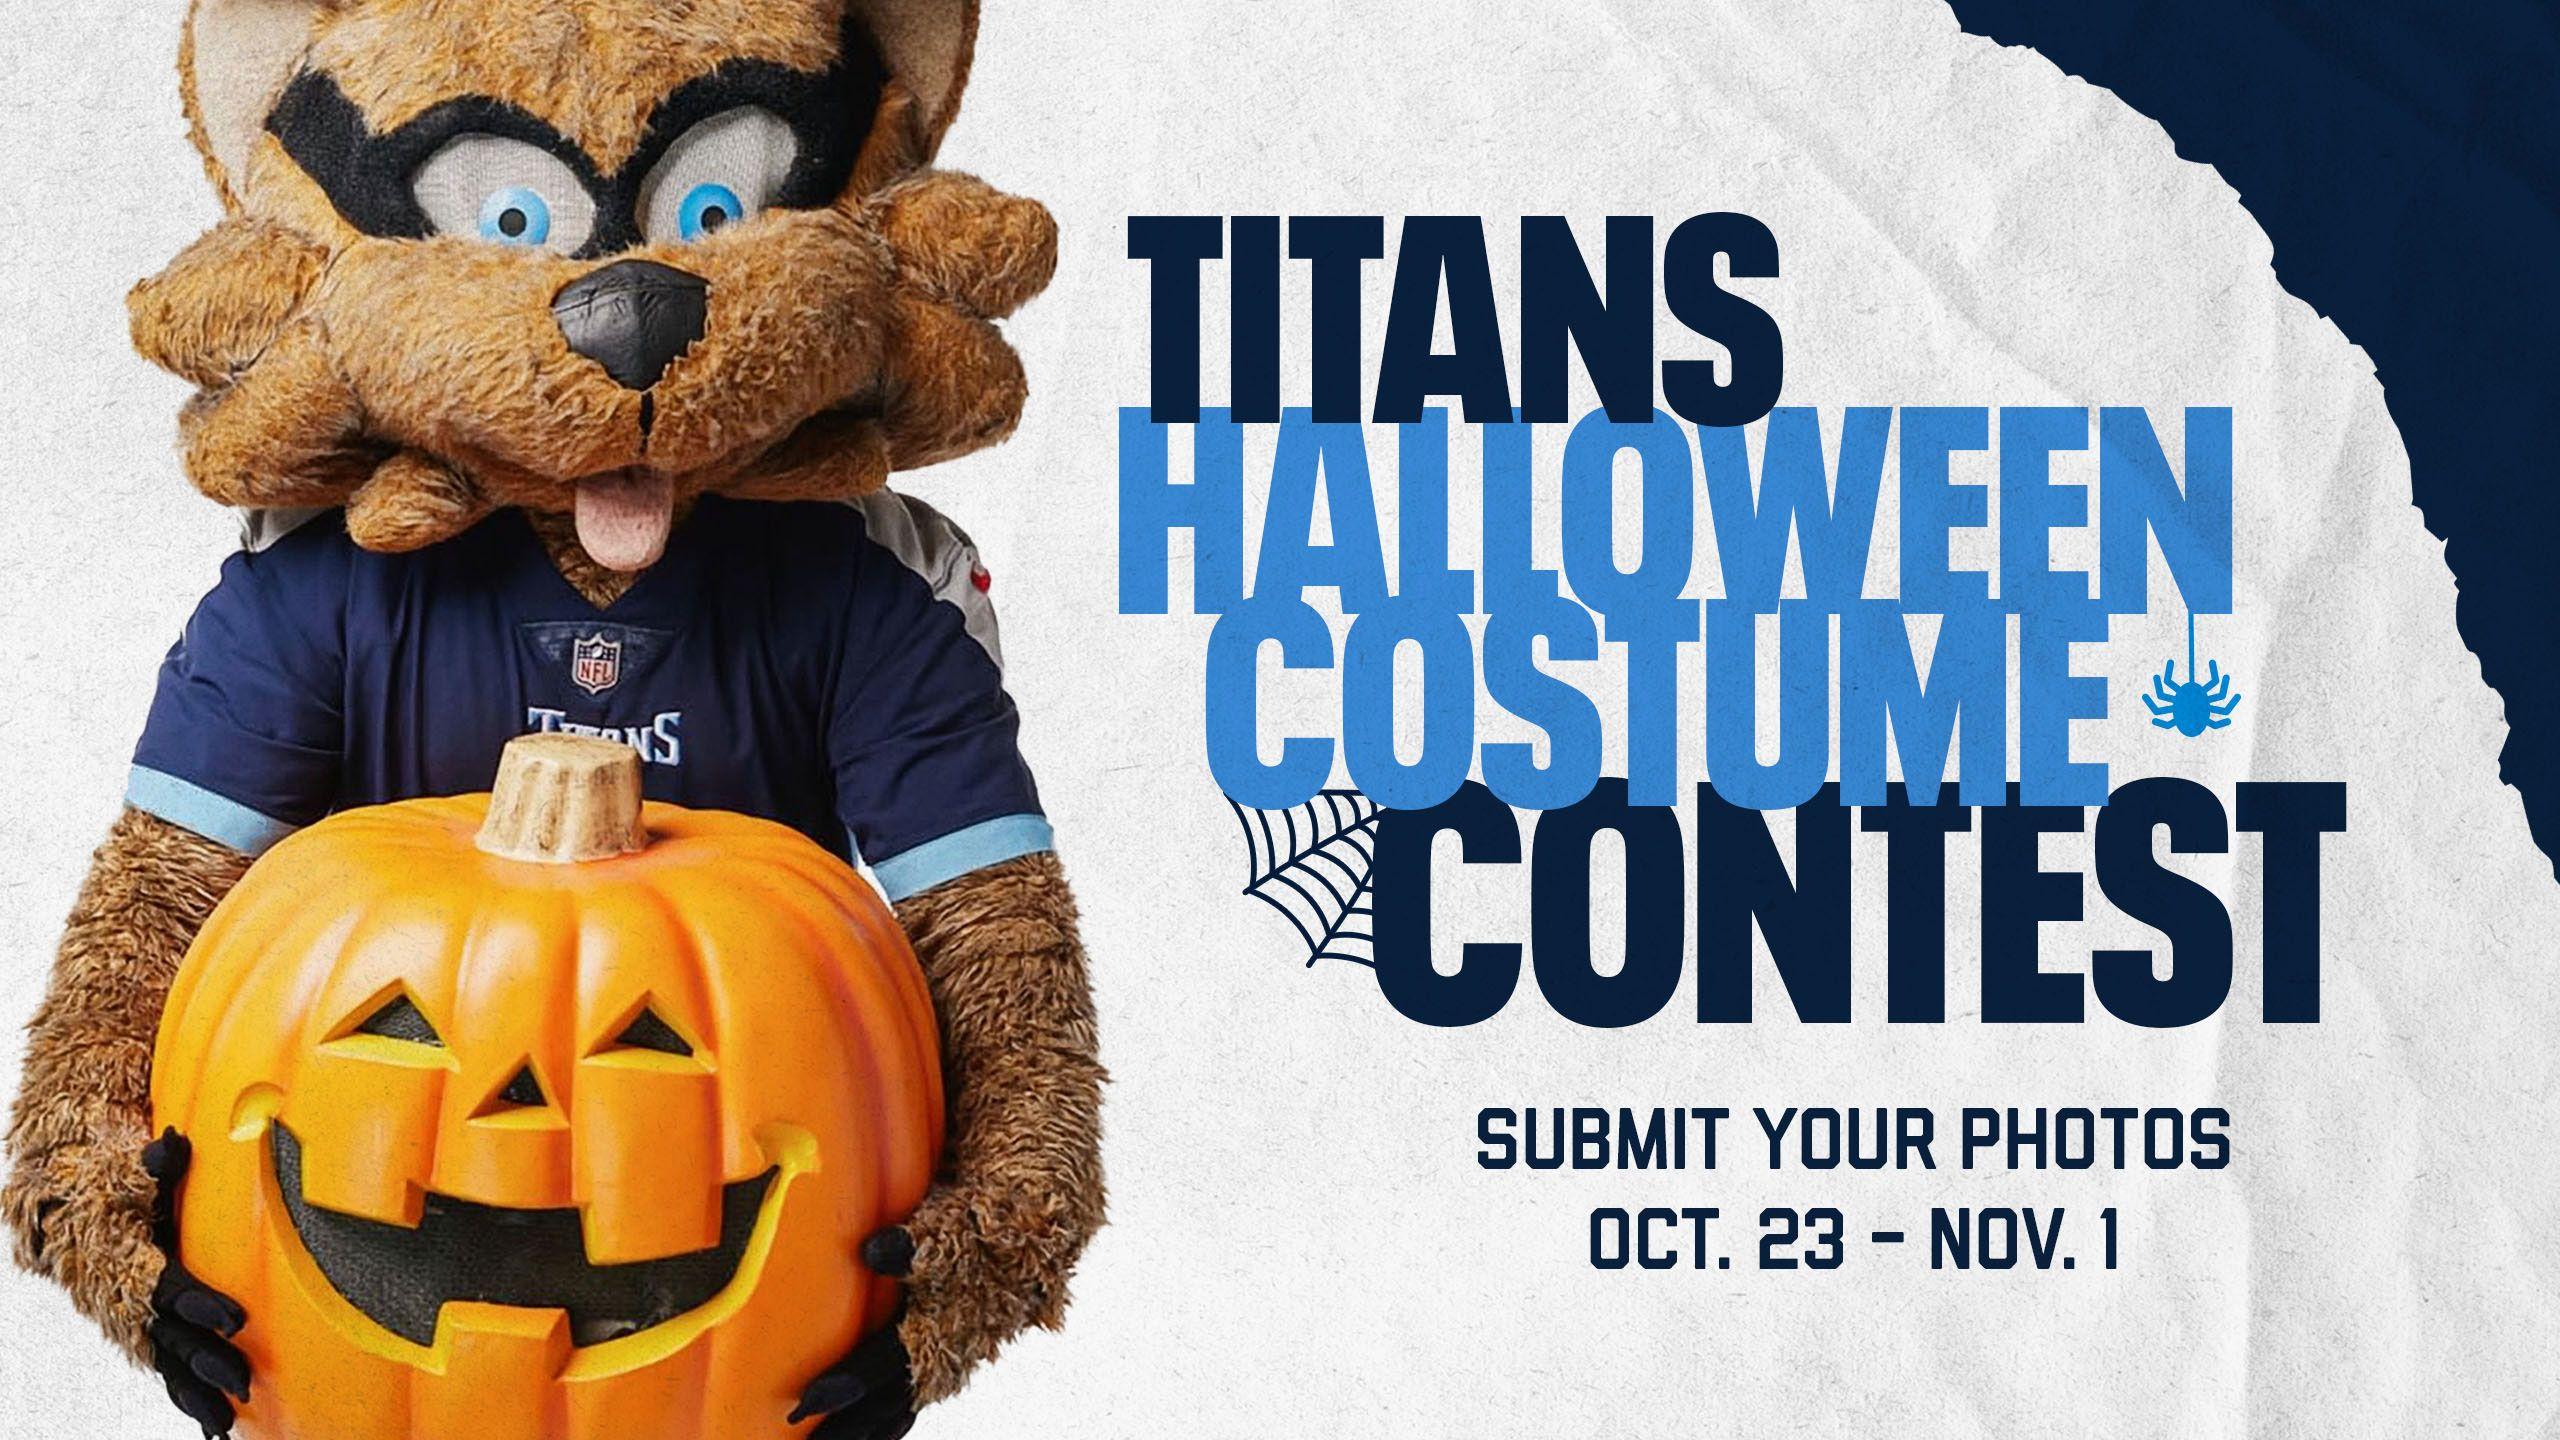 Titans Halloween Costume Contest